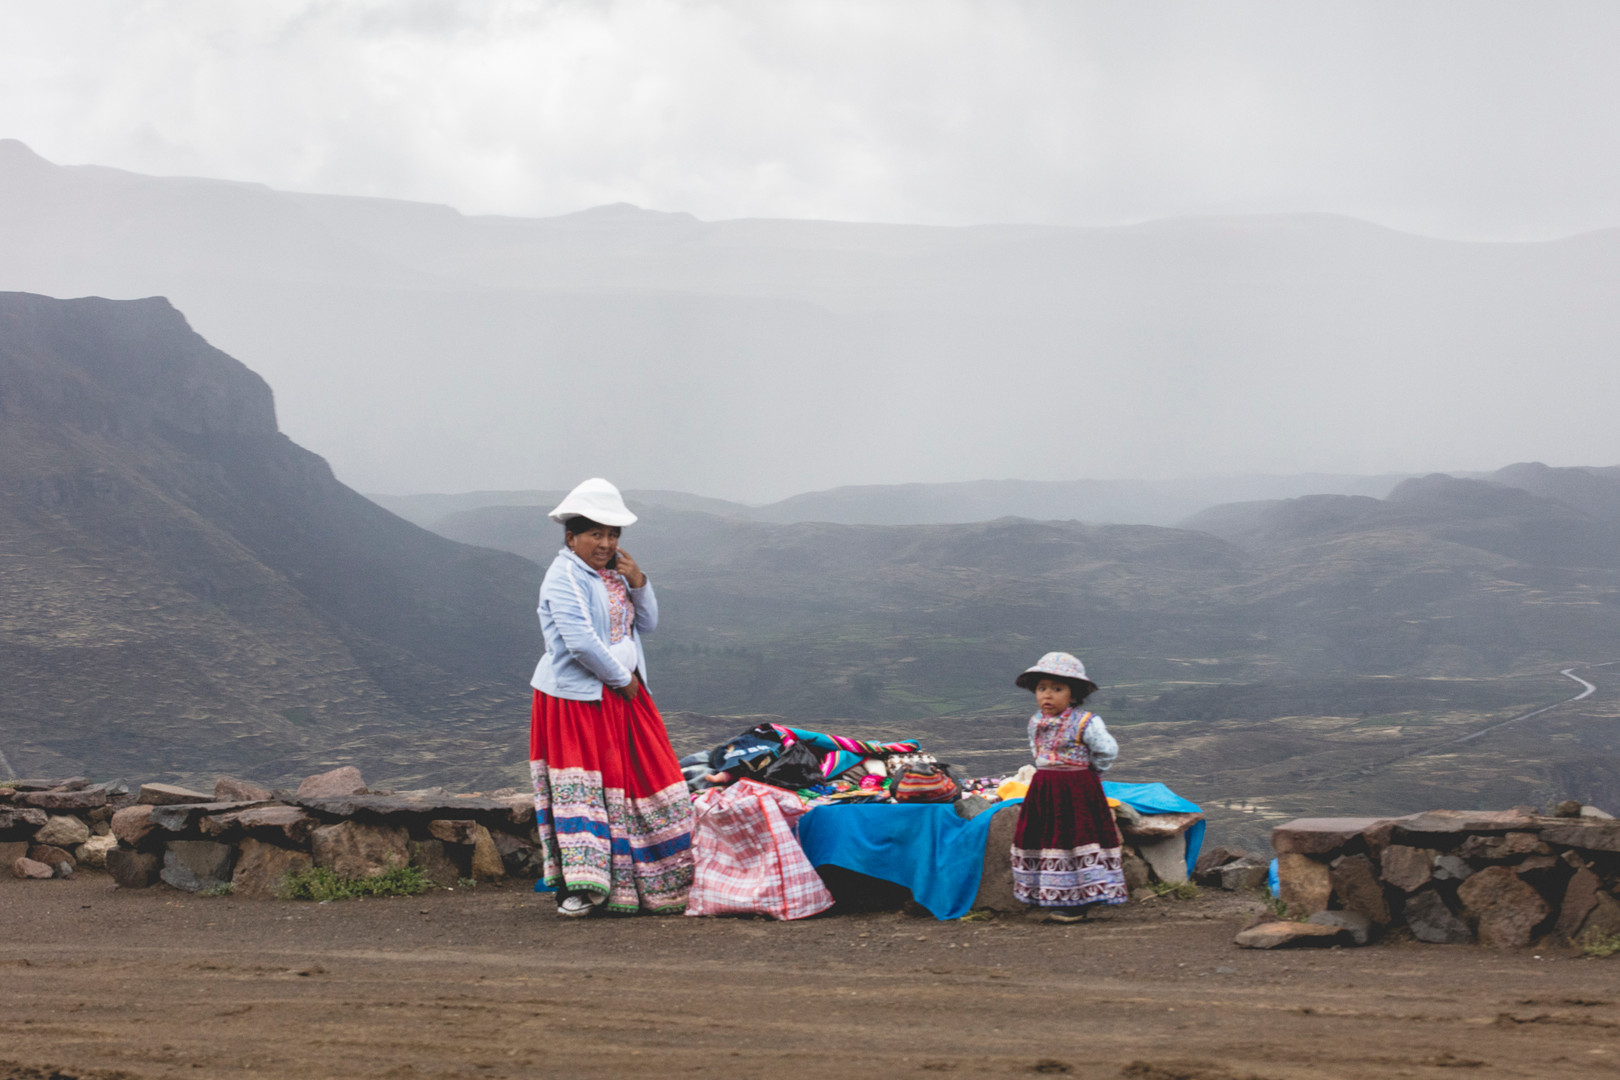 Street vendors in Colca Valley, Perù, February 2016